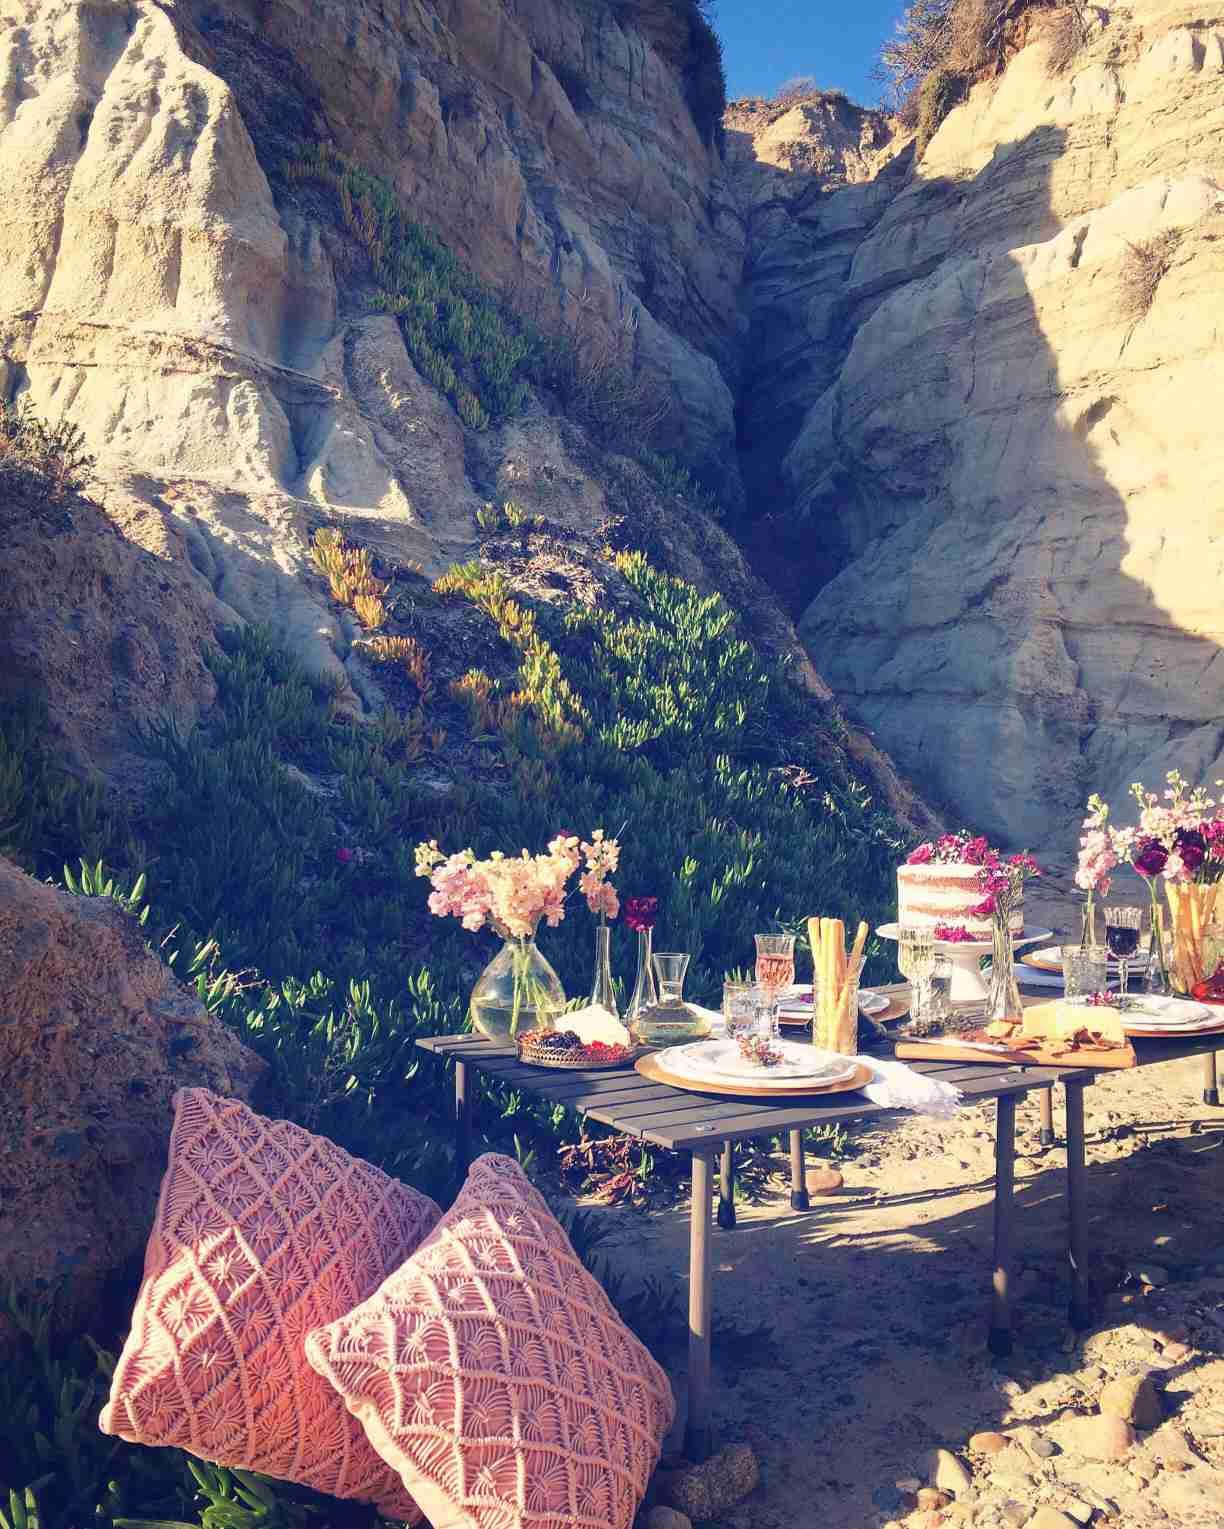 Elaborate picnic in rocky terrain